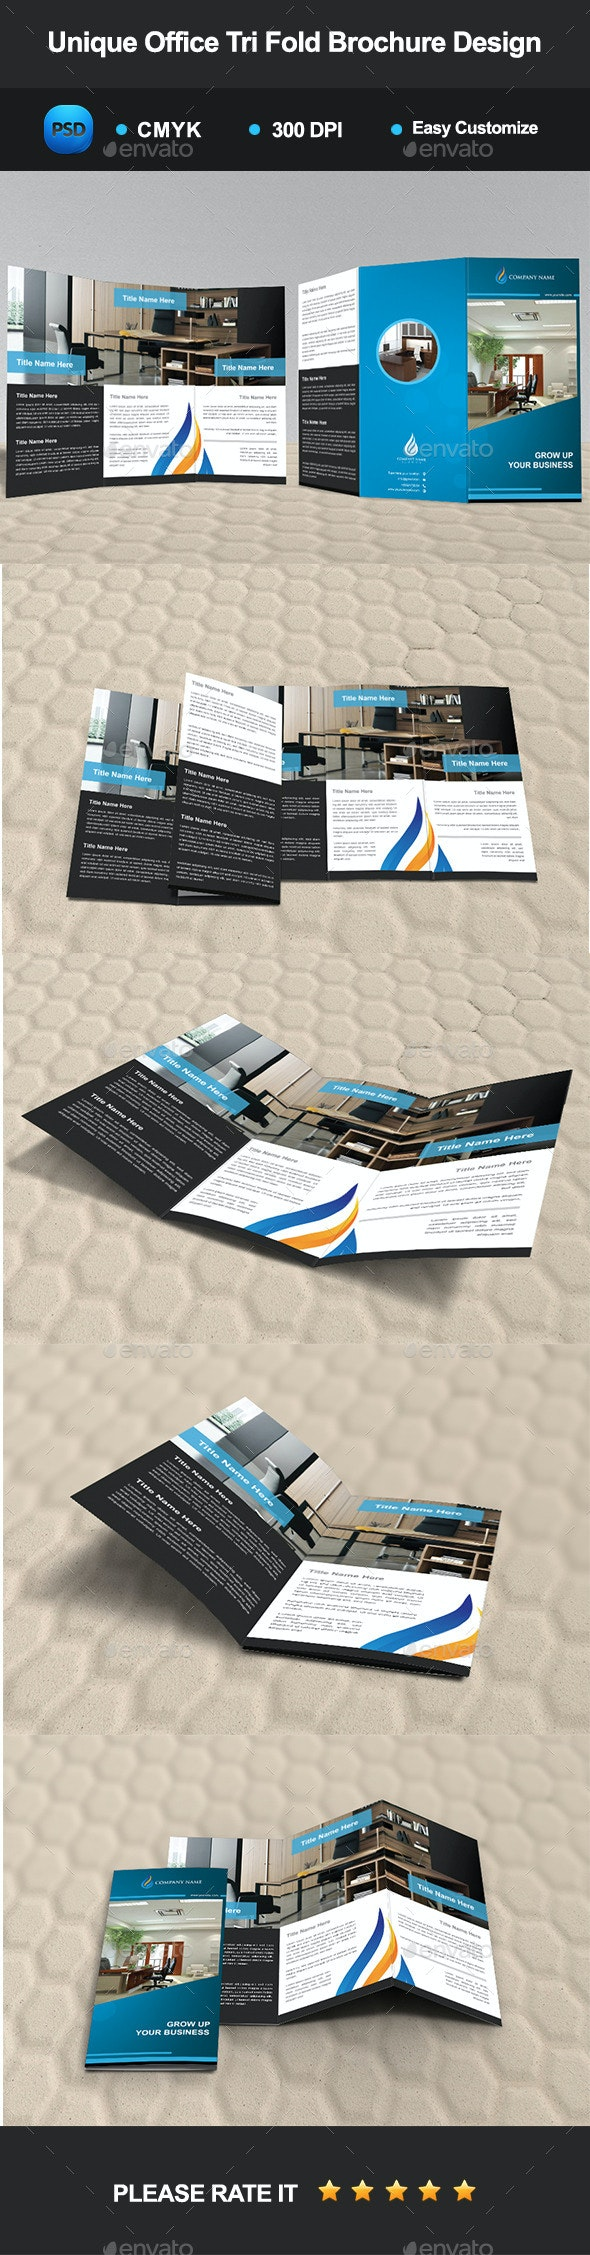 Unique Office Tri Fold Brochure Design - Corporate Brochures